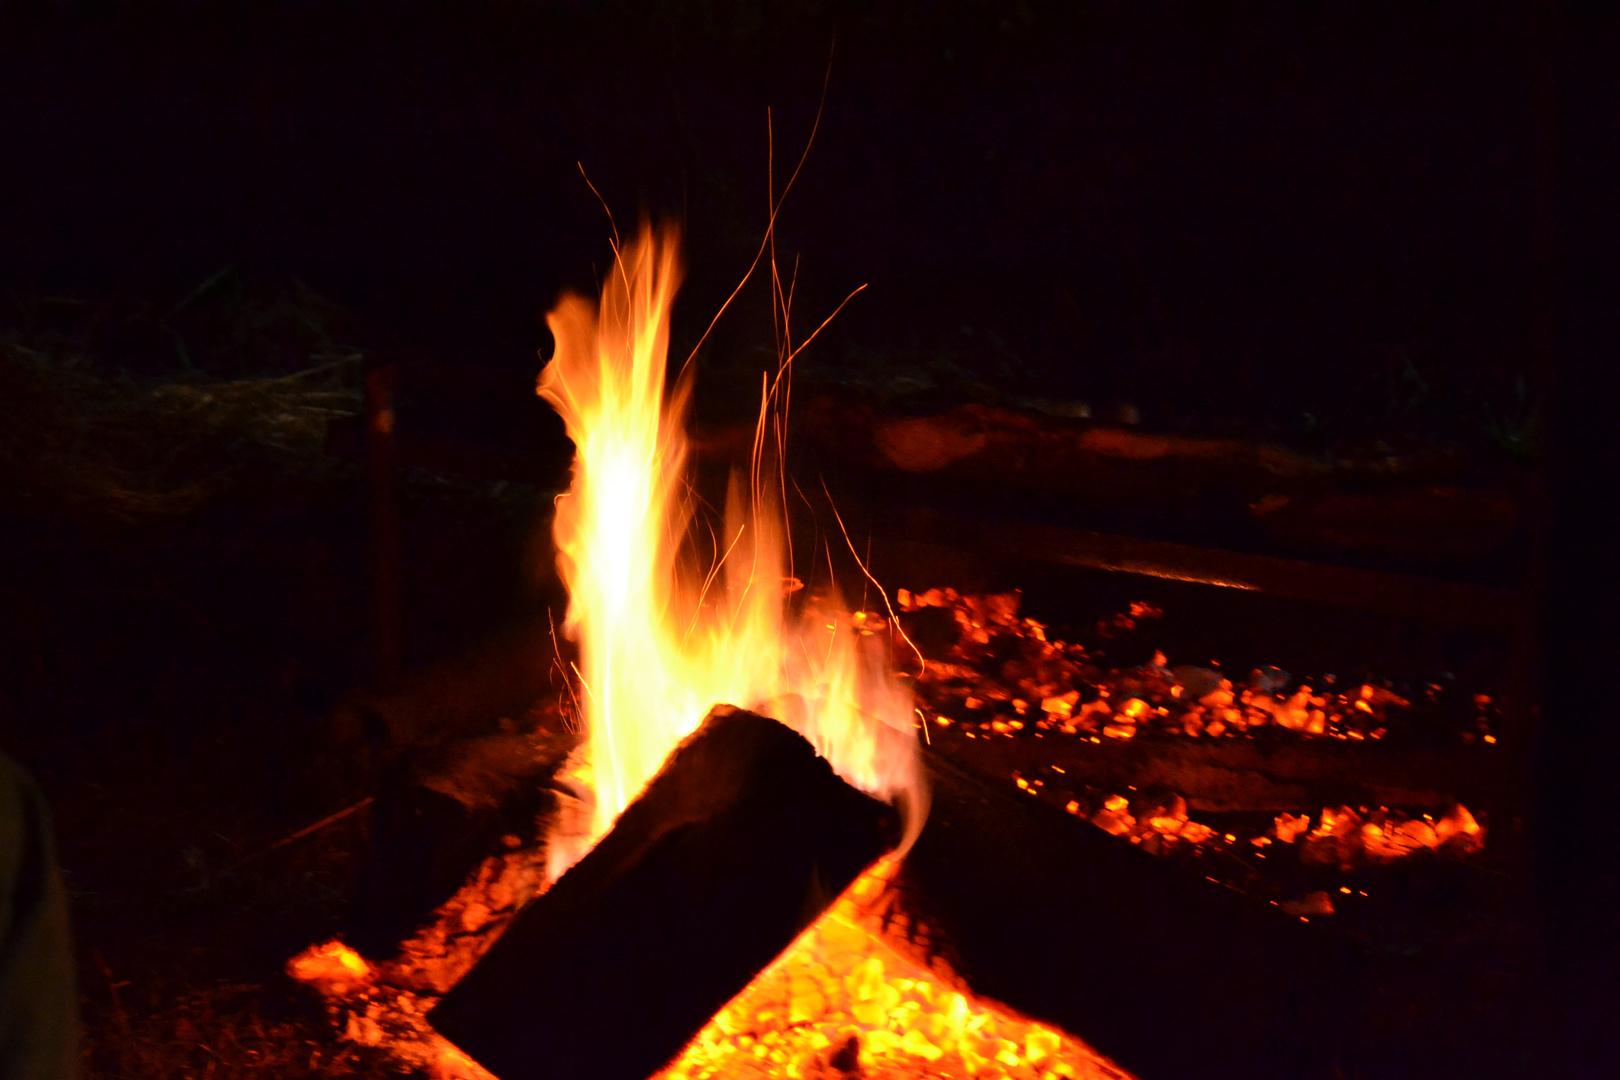 ...Fuego fuego fuego fuego Estamos enfermos Estamos enfermos Perdonennos Perdonennos...